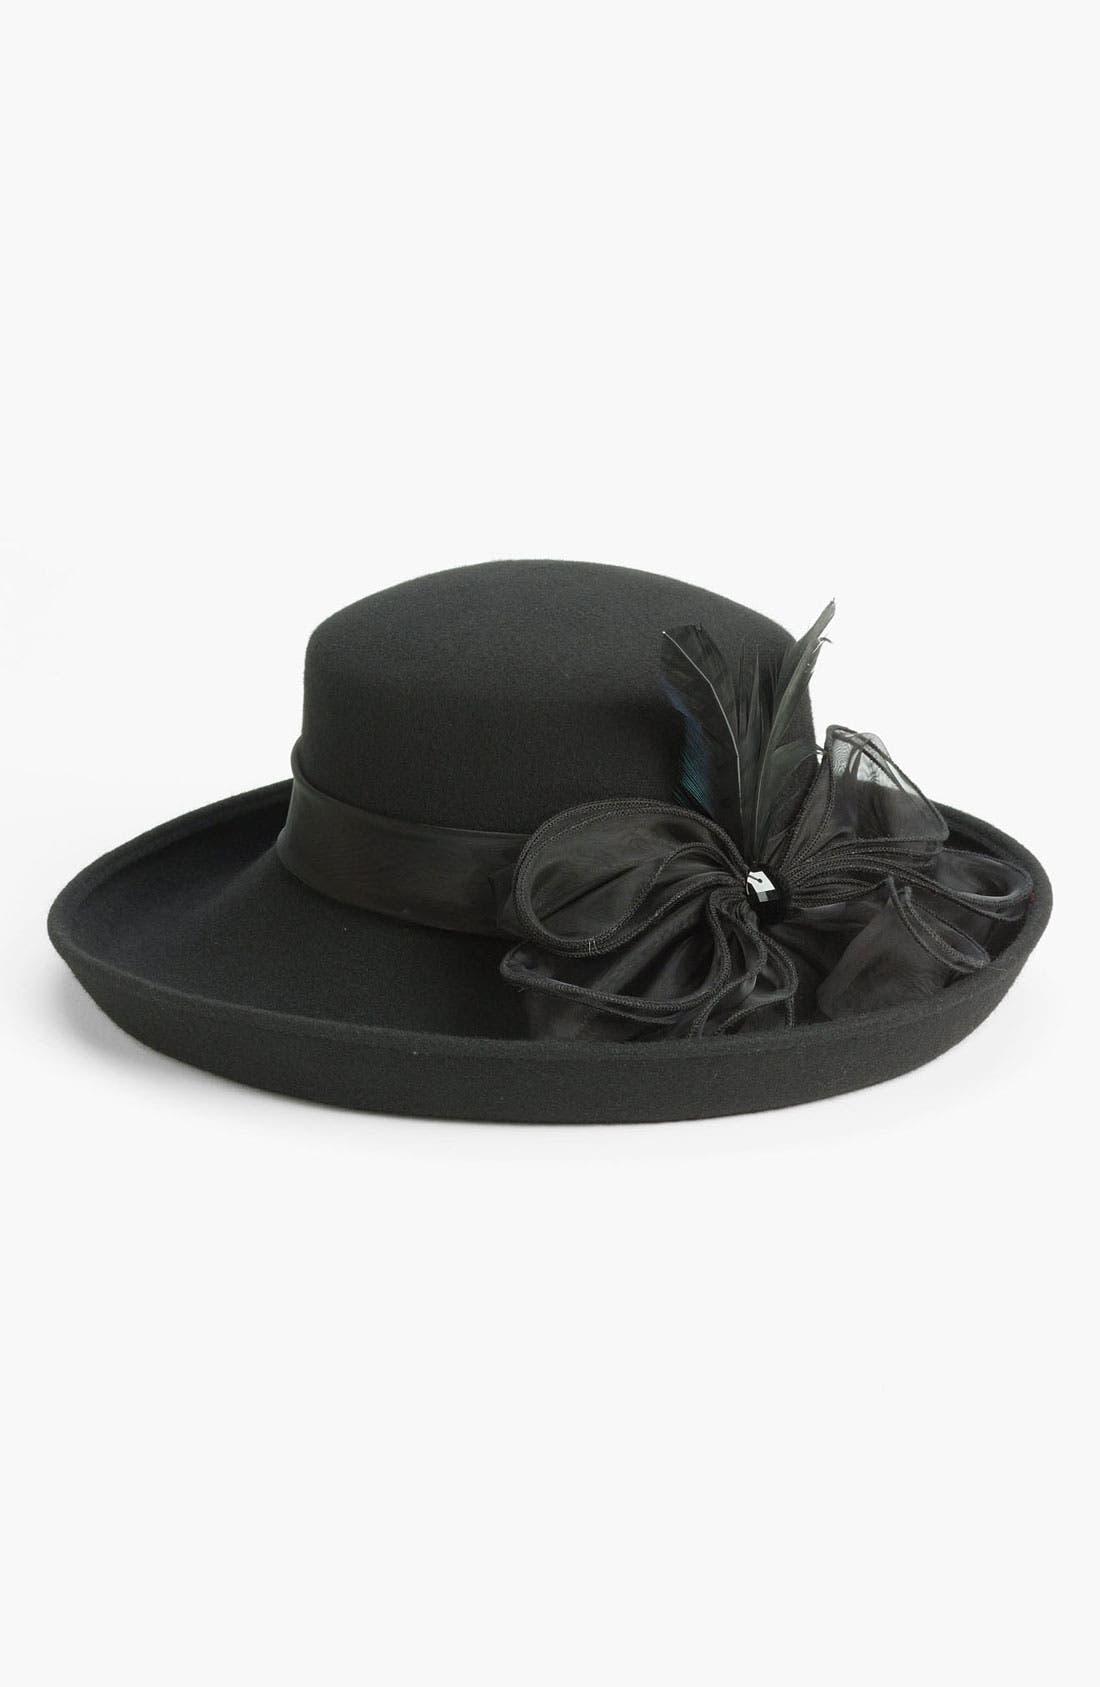 Main Image - August Hat 'Helene' Hat